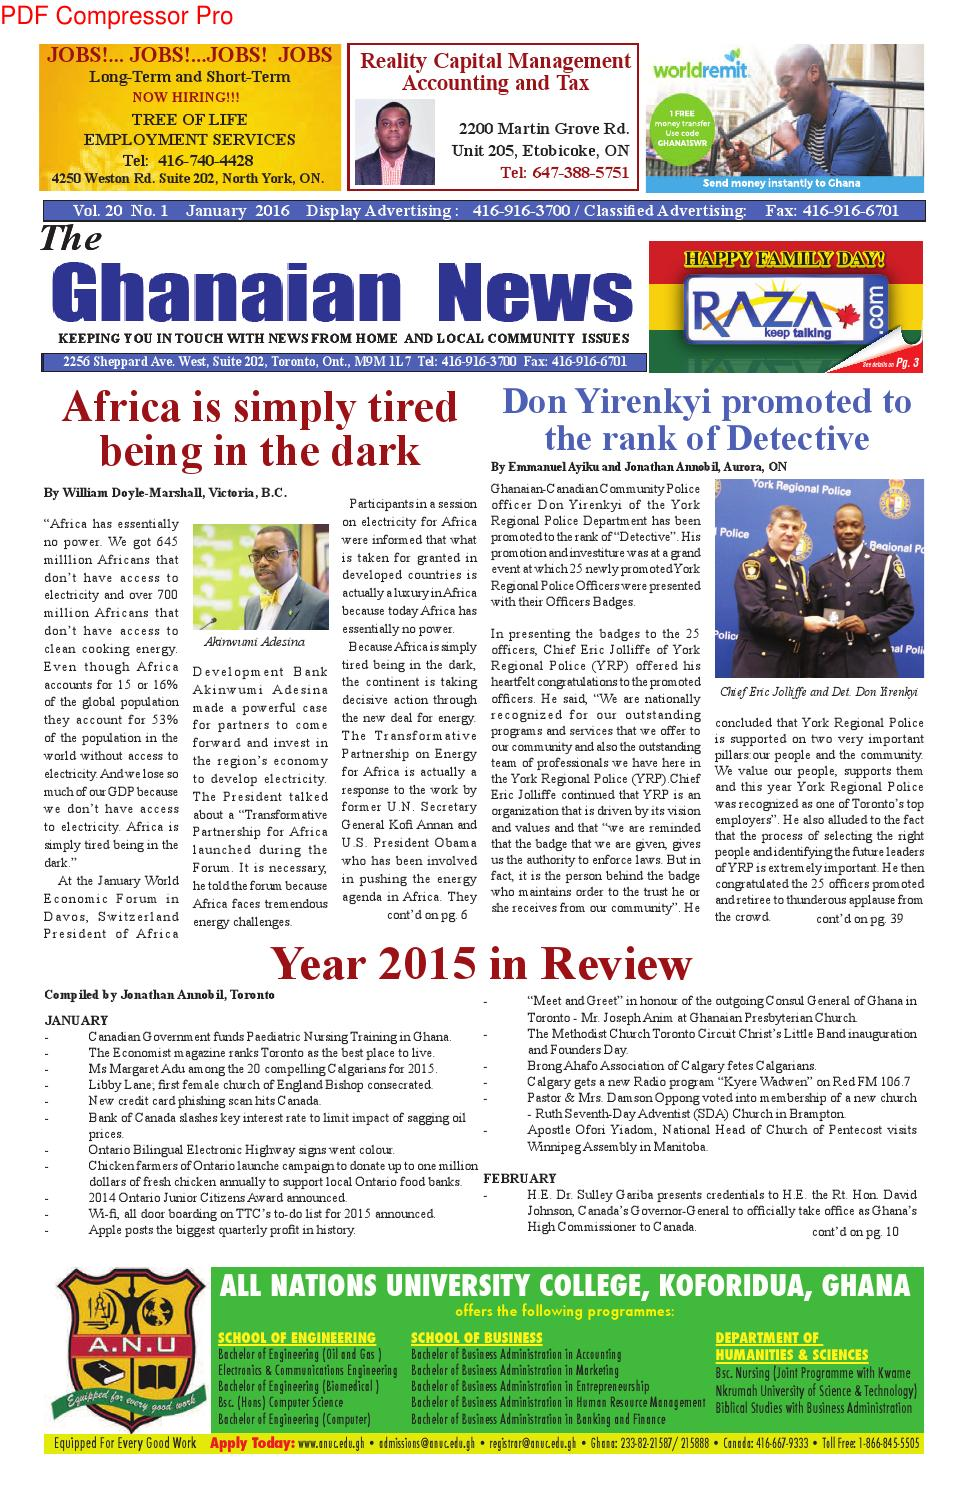 Ghanaian News January 2016 By Razak Ray Axe Banks Issuu